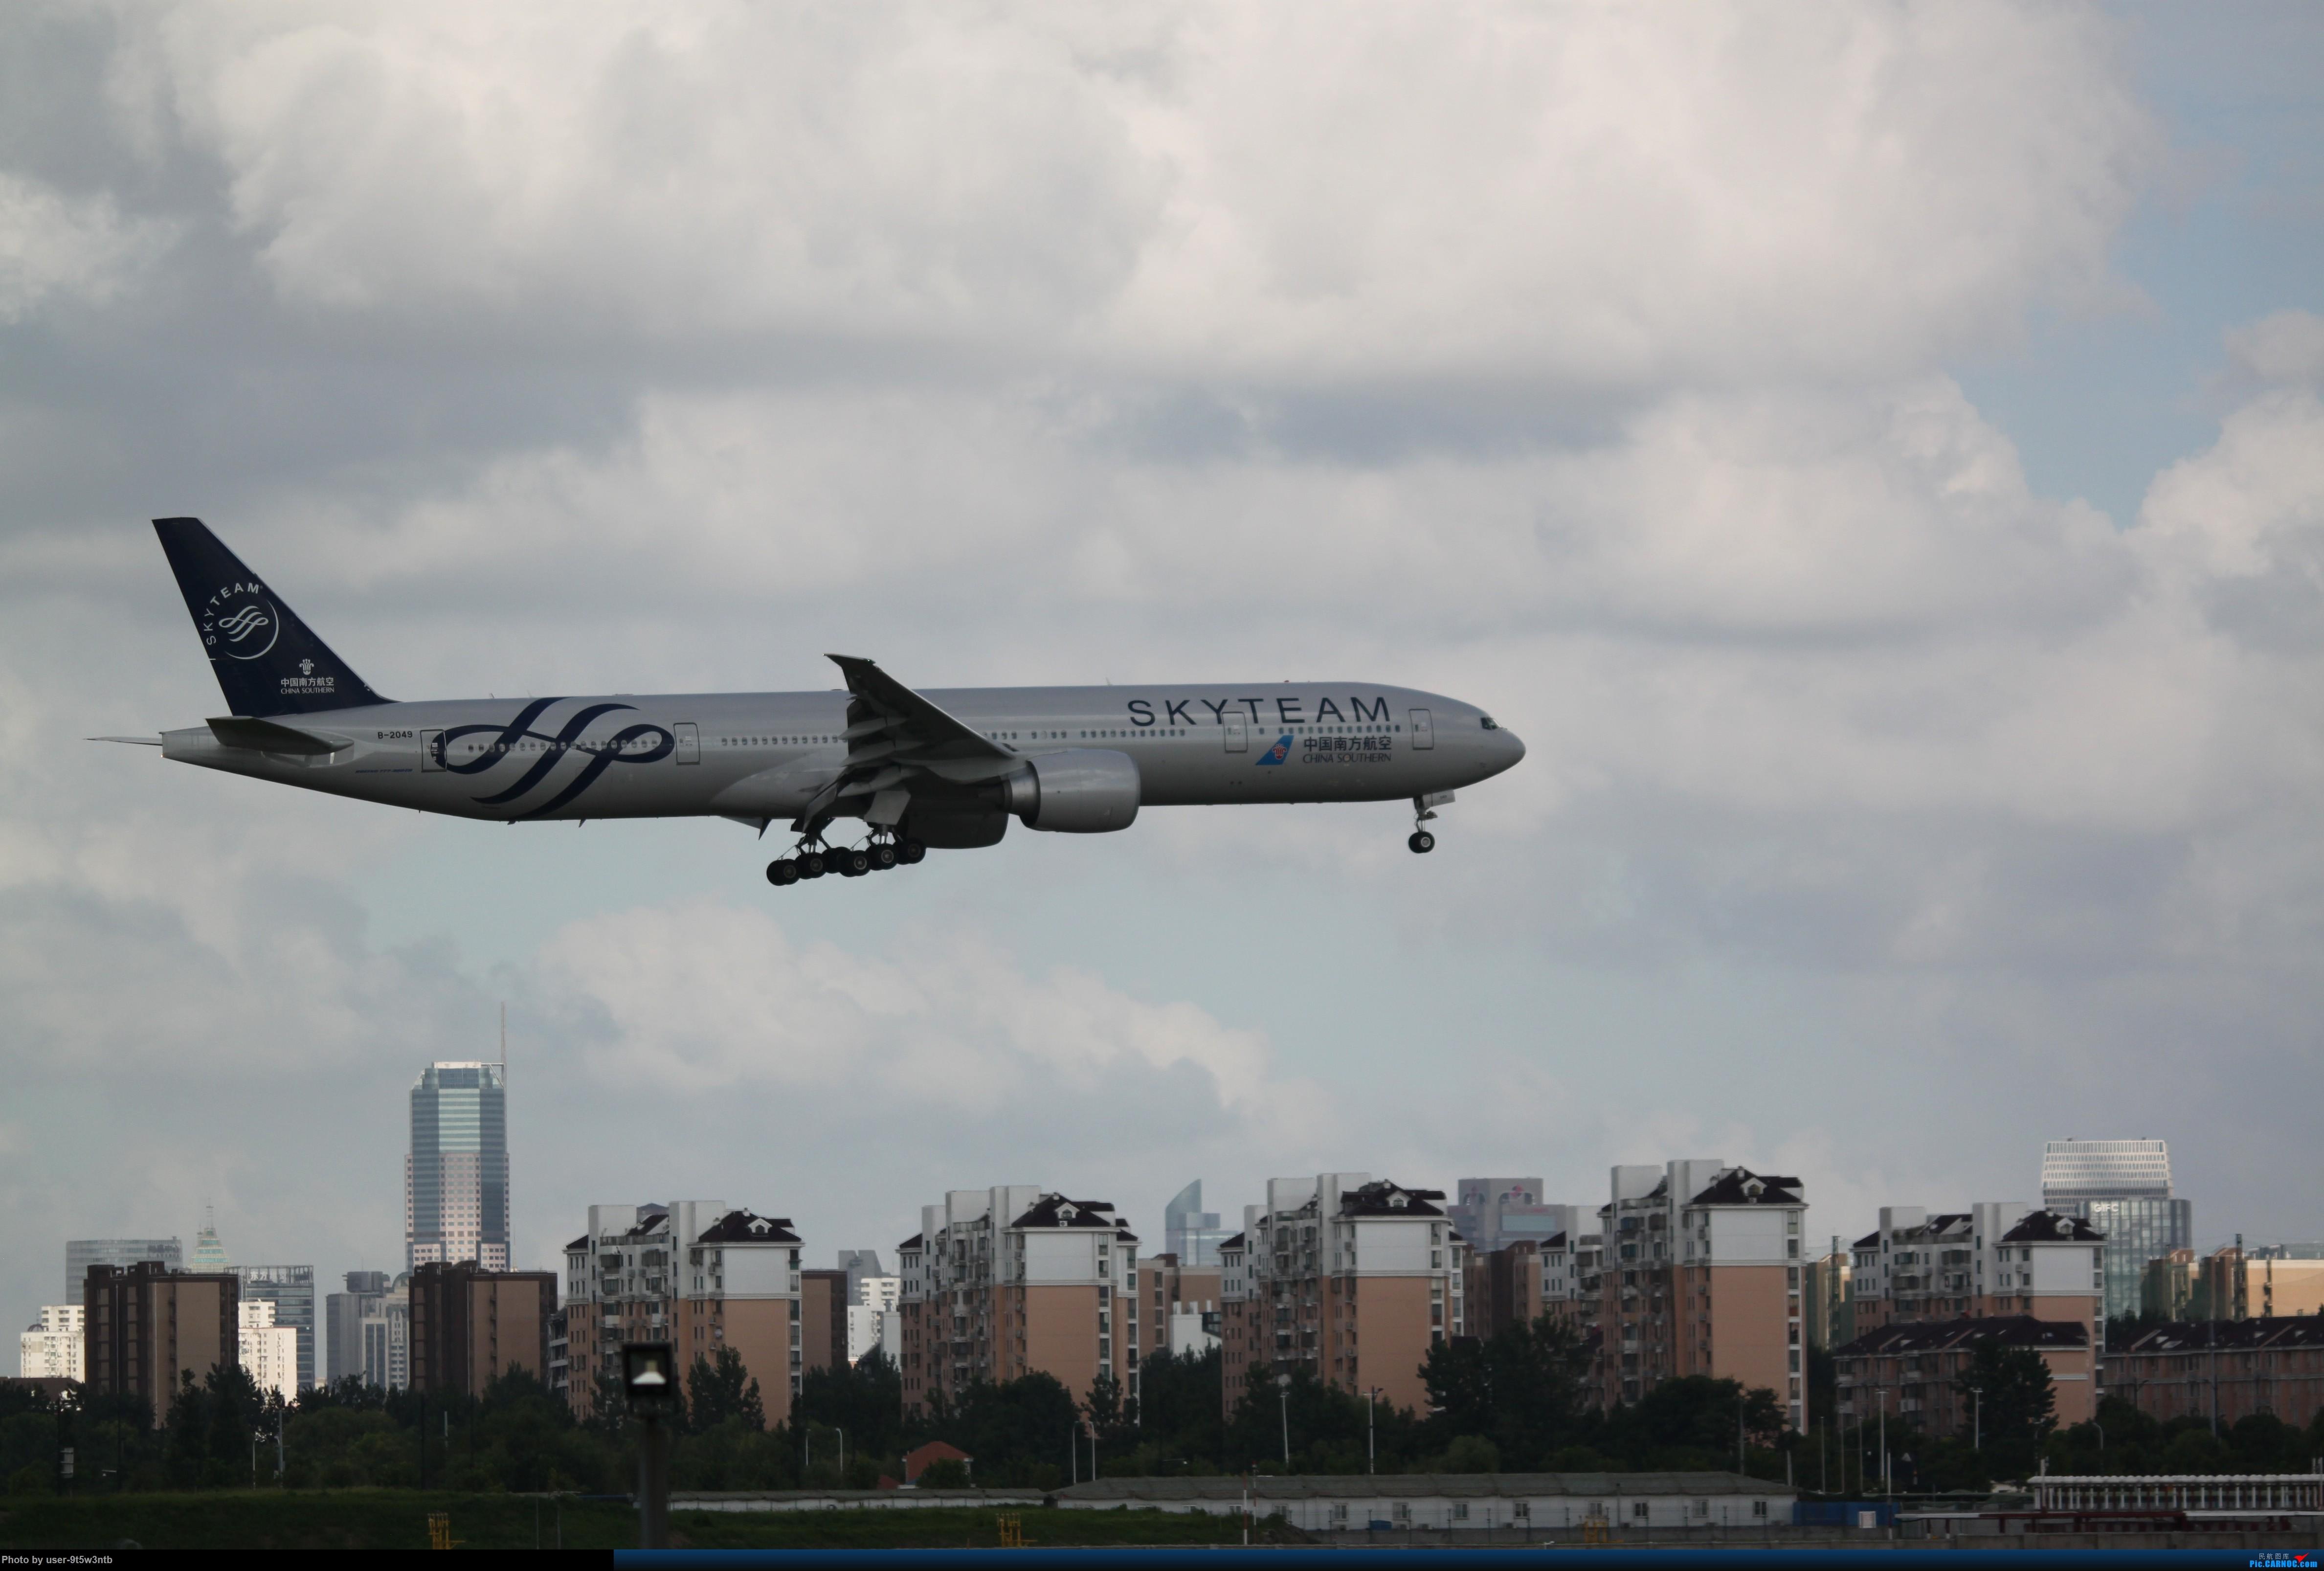 Re:[原创]来整理下最近在虹桥拍到的彩绘机吧~ BOEING 777-300ER B-2049 中国上海虹桥国际机场